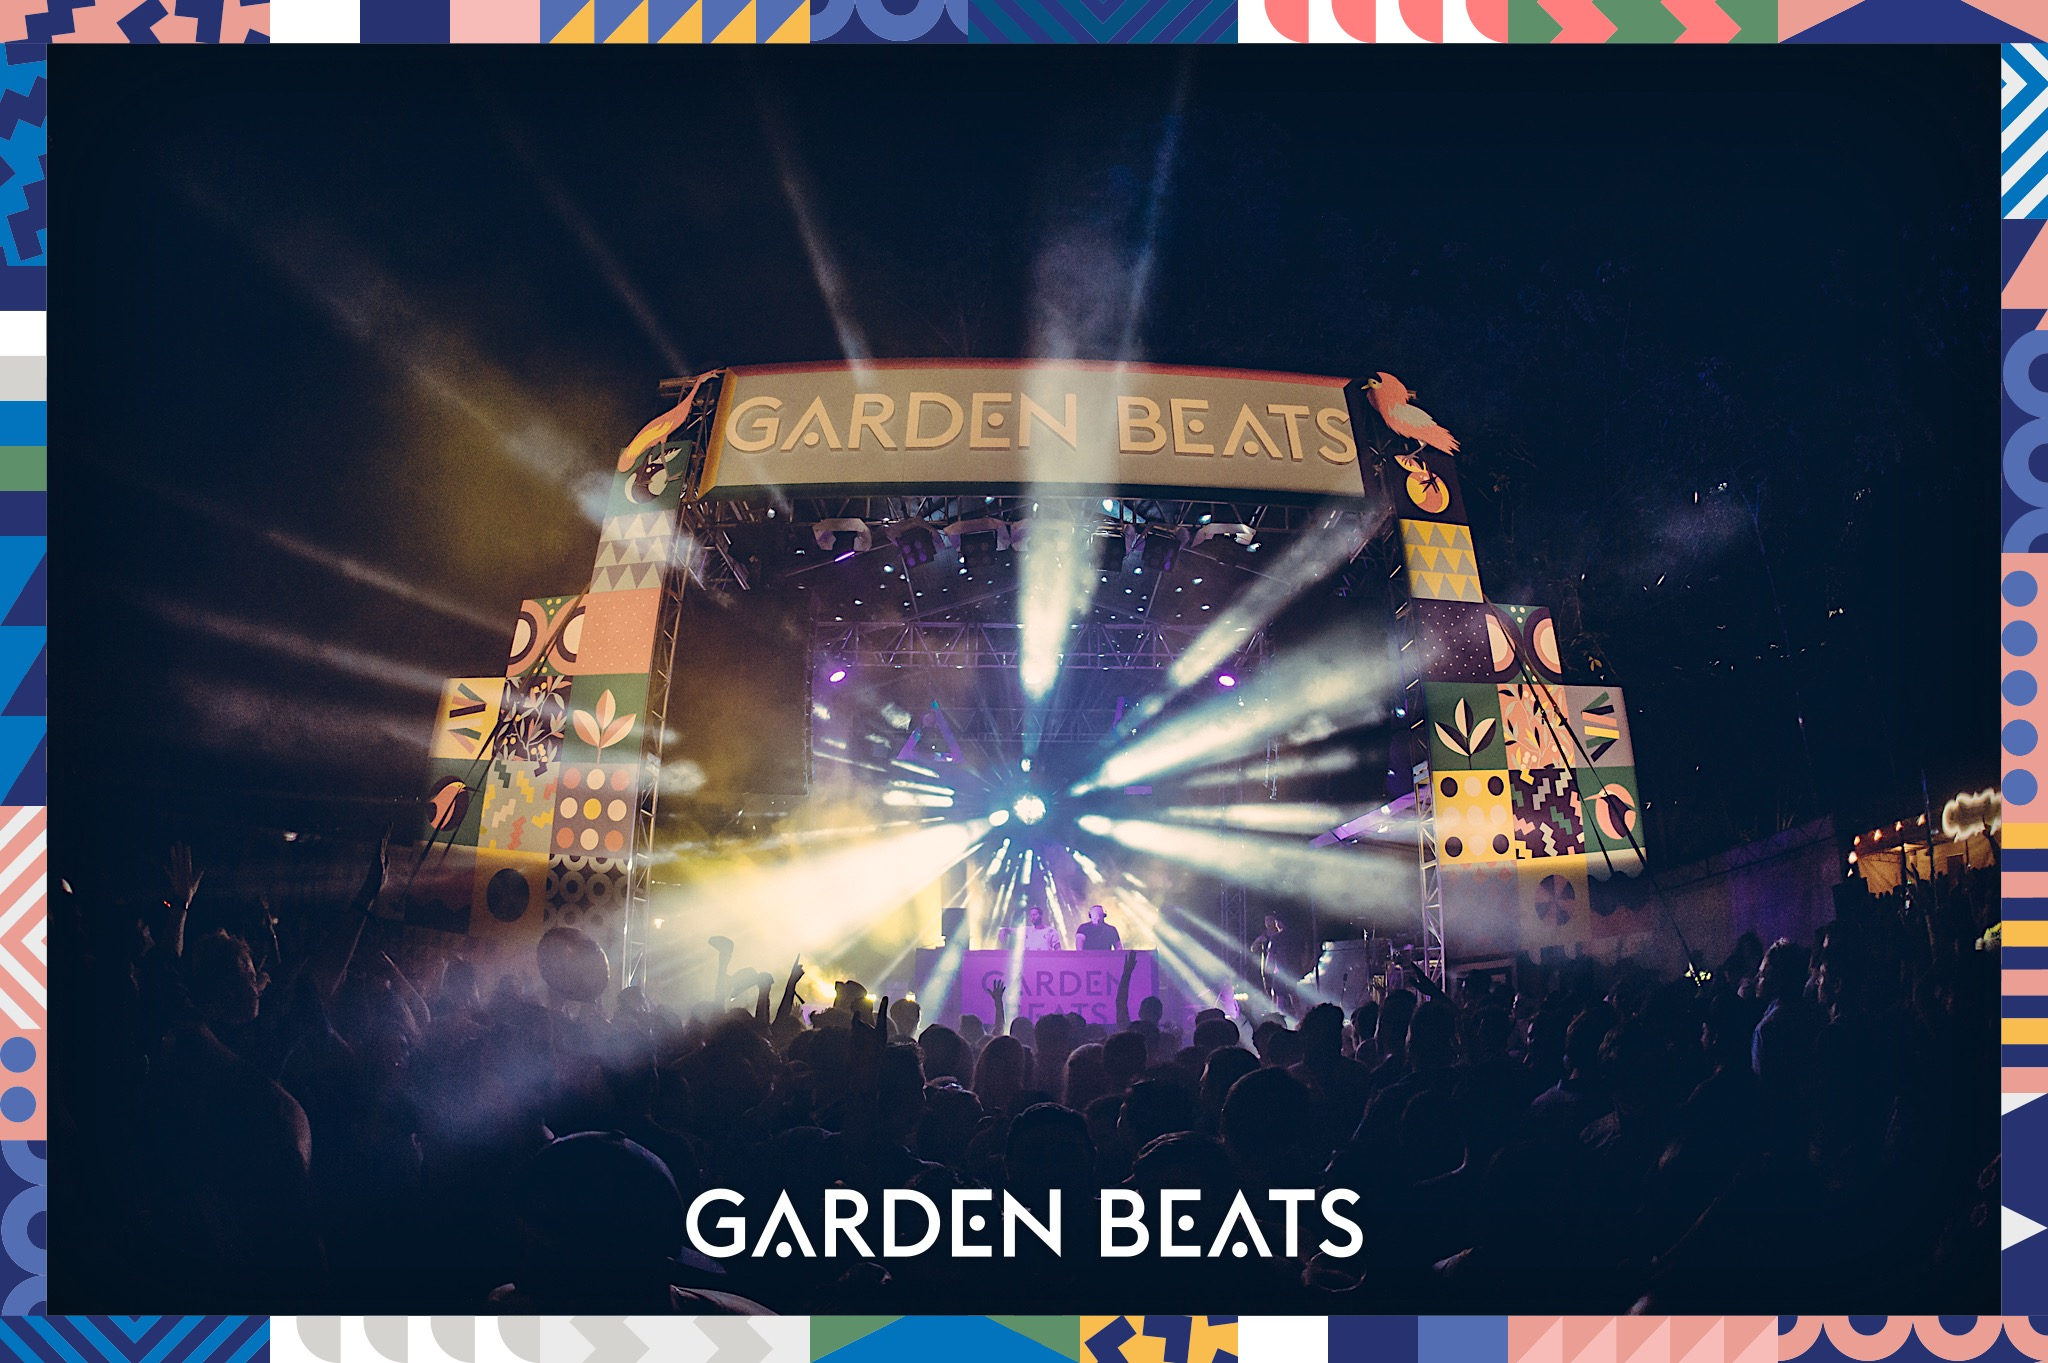 03032018_GardenBeats_Colossal858_Watermarked.jpg